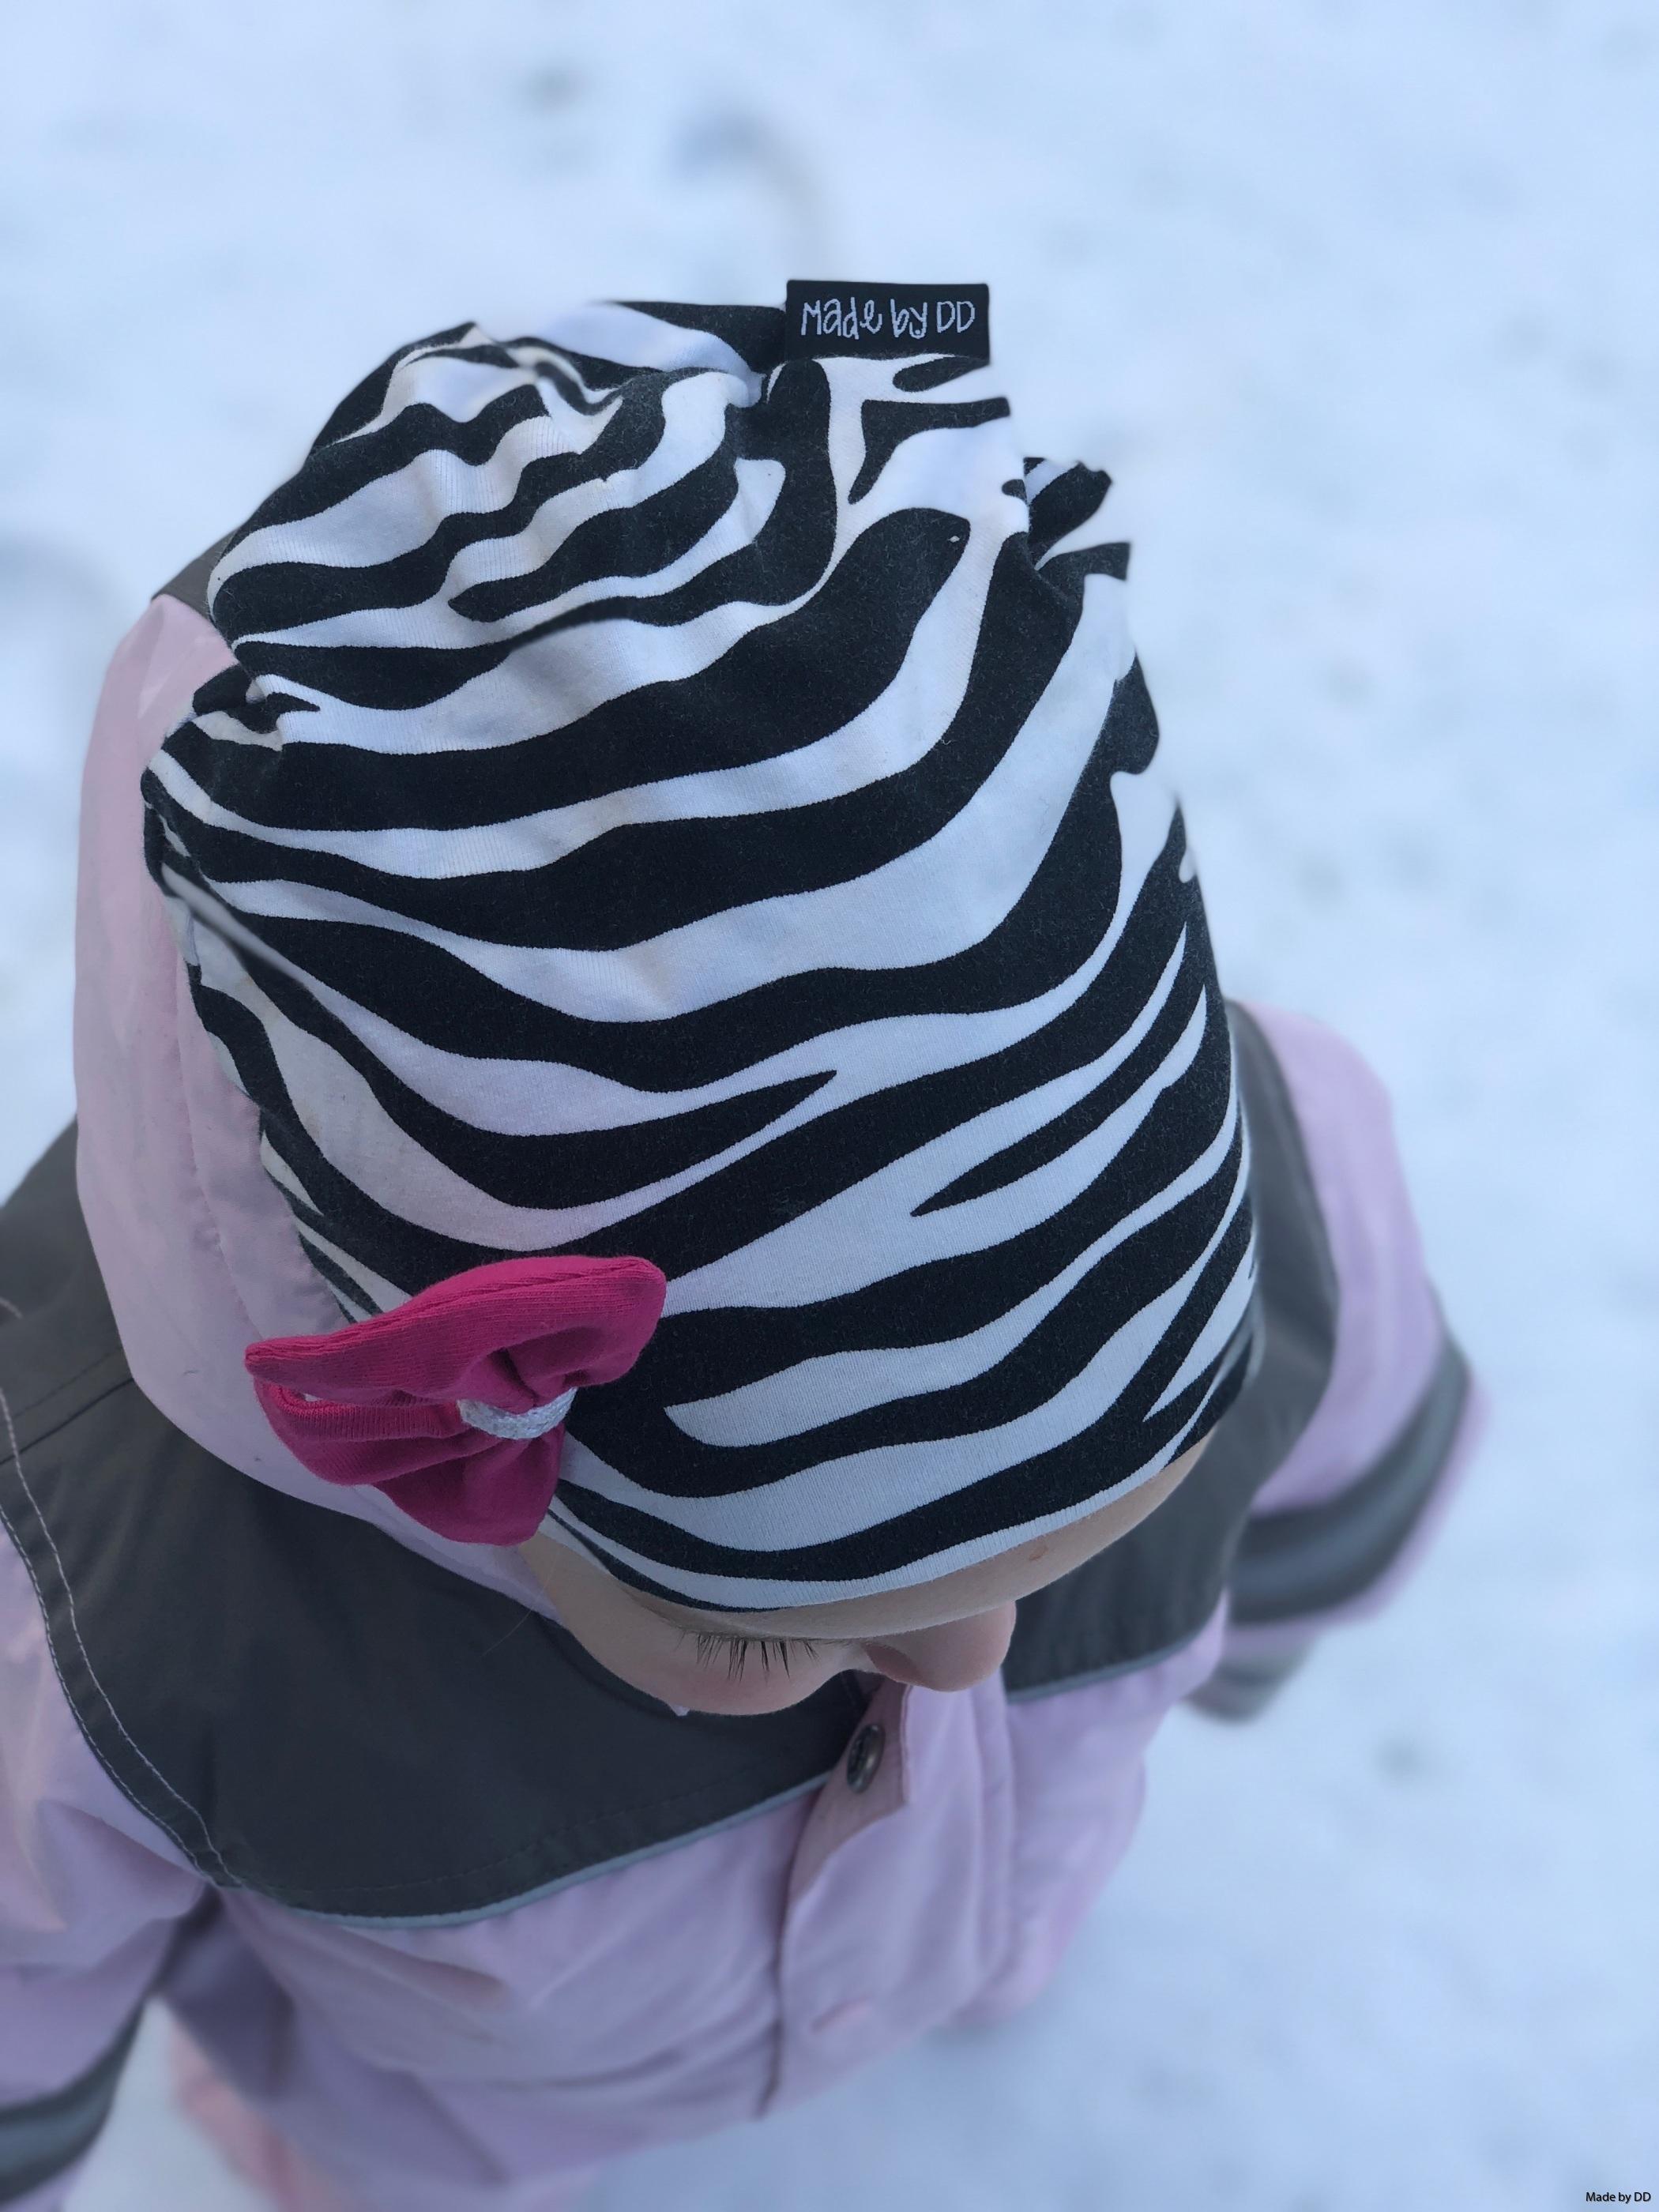 Inspirationsbild mössa beanie zebra eko Made by DD